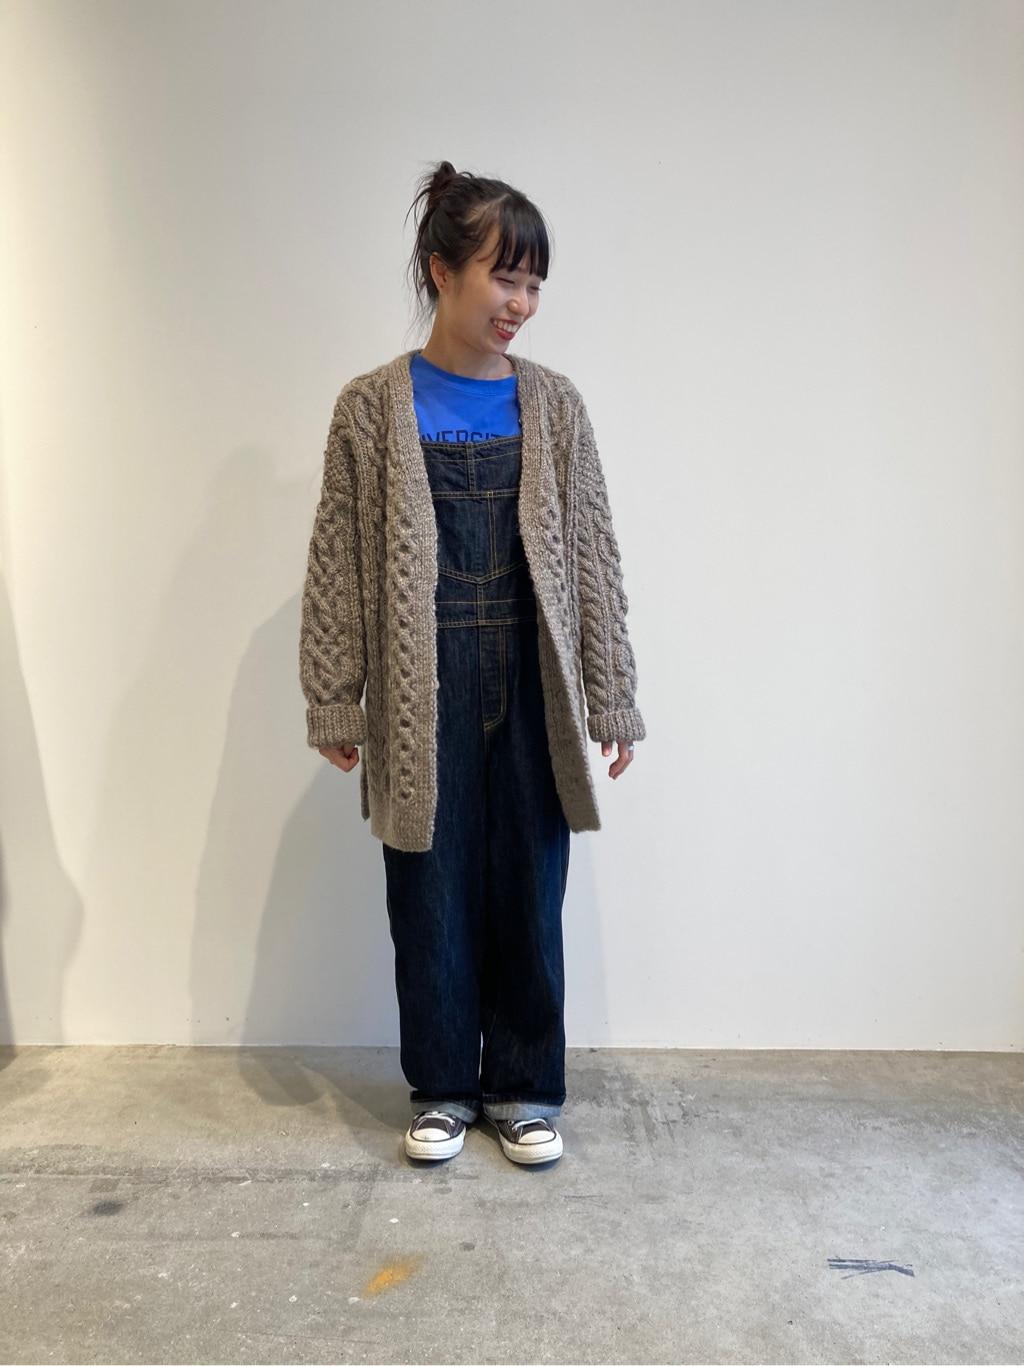 - bulle de savon FLAT AMB 名古屋栄路面 身長:152cm 2020.09.28